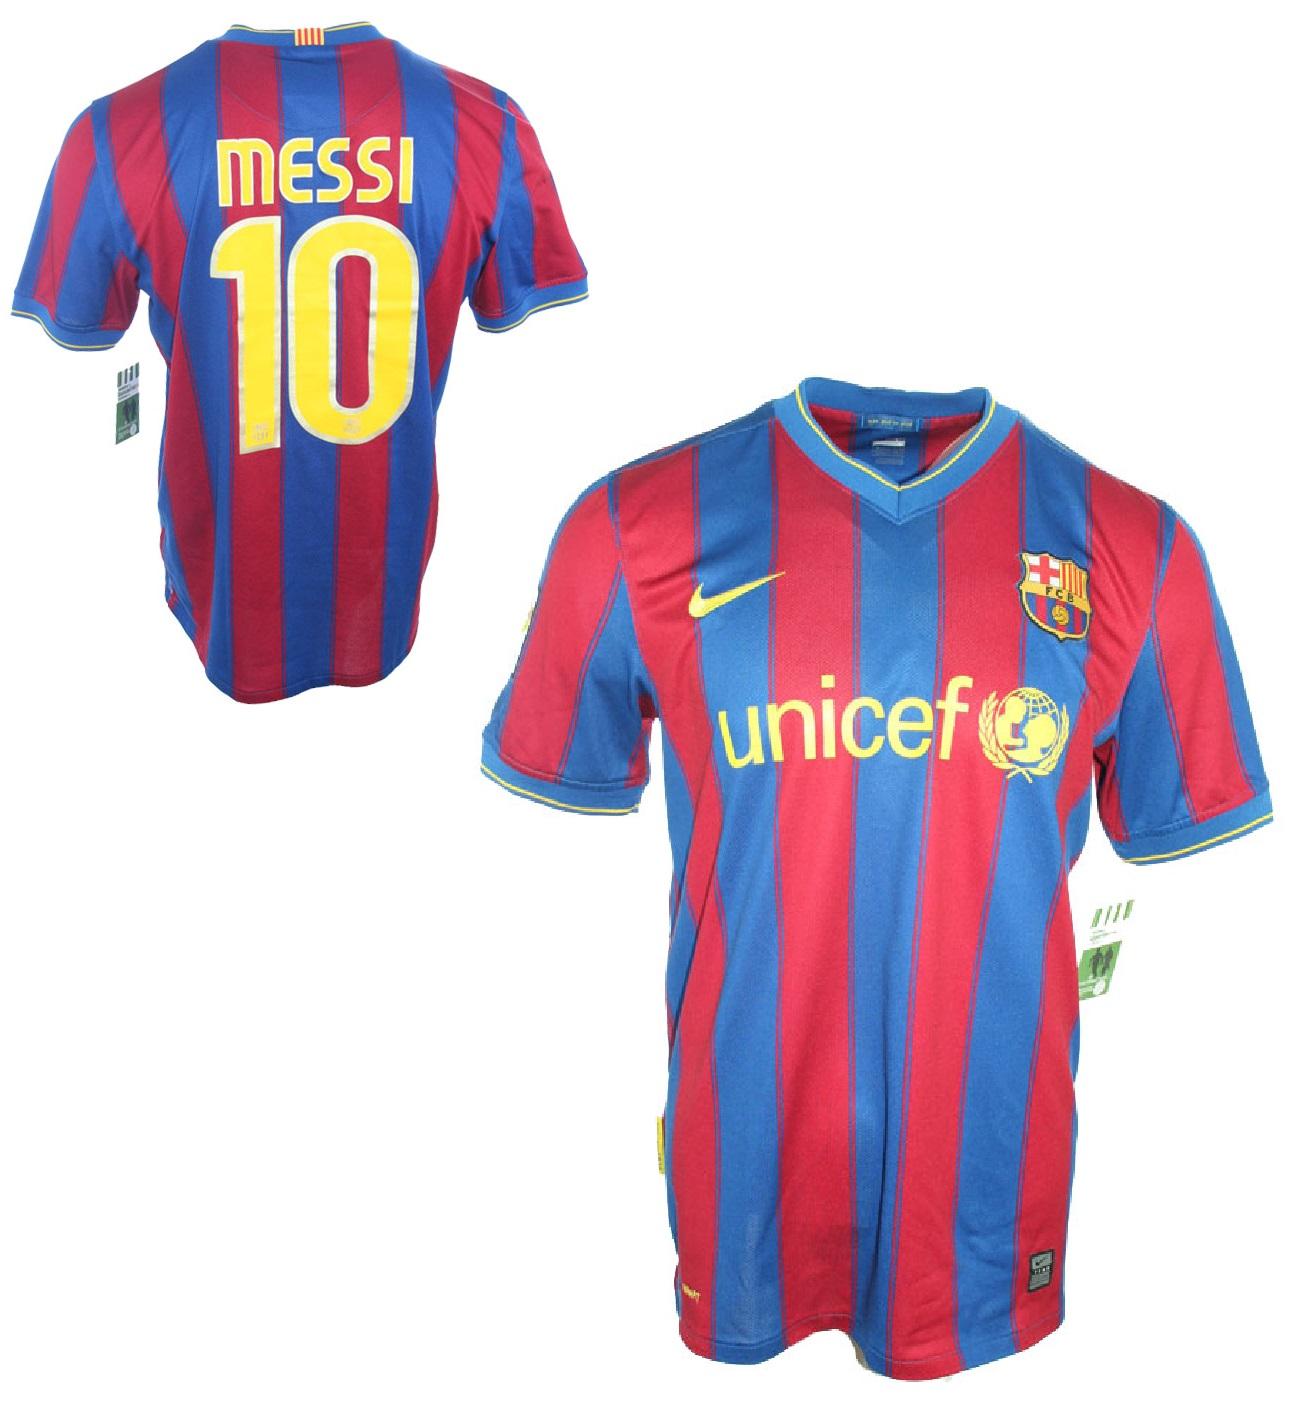 Nike Fc Barcelona Jersey 10 Lionel Messi 2009 10 Cl Winner Men S S M L Xl Xxl Shirt Buy Order Cheap Online Shop Spieler Trikot De Retro Vintage Old Football Shirts Jersey From Super Stars